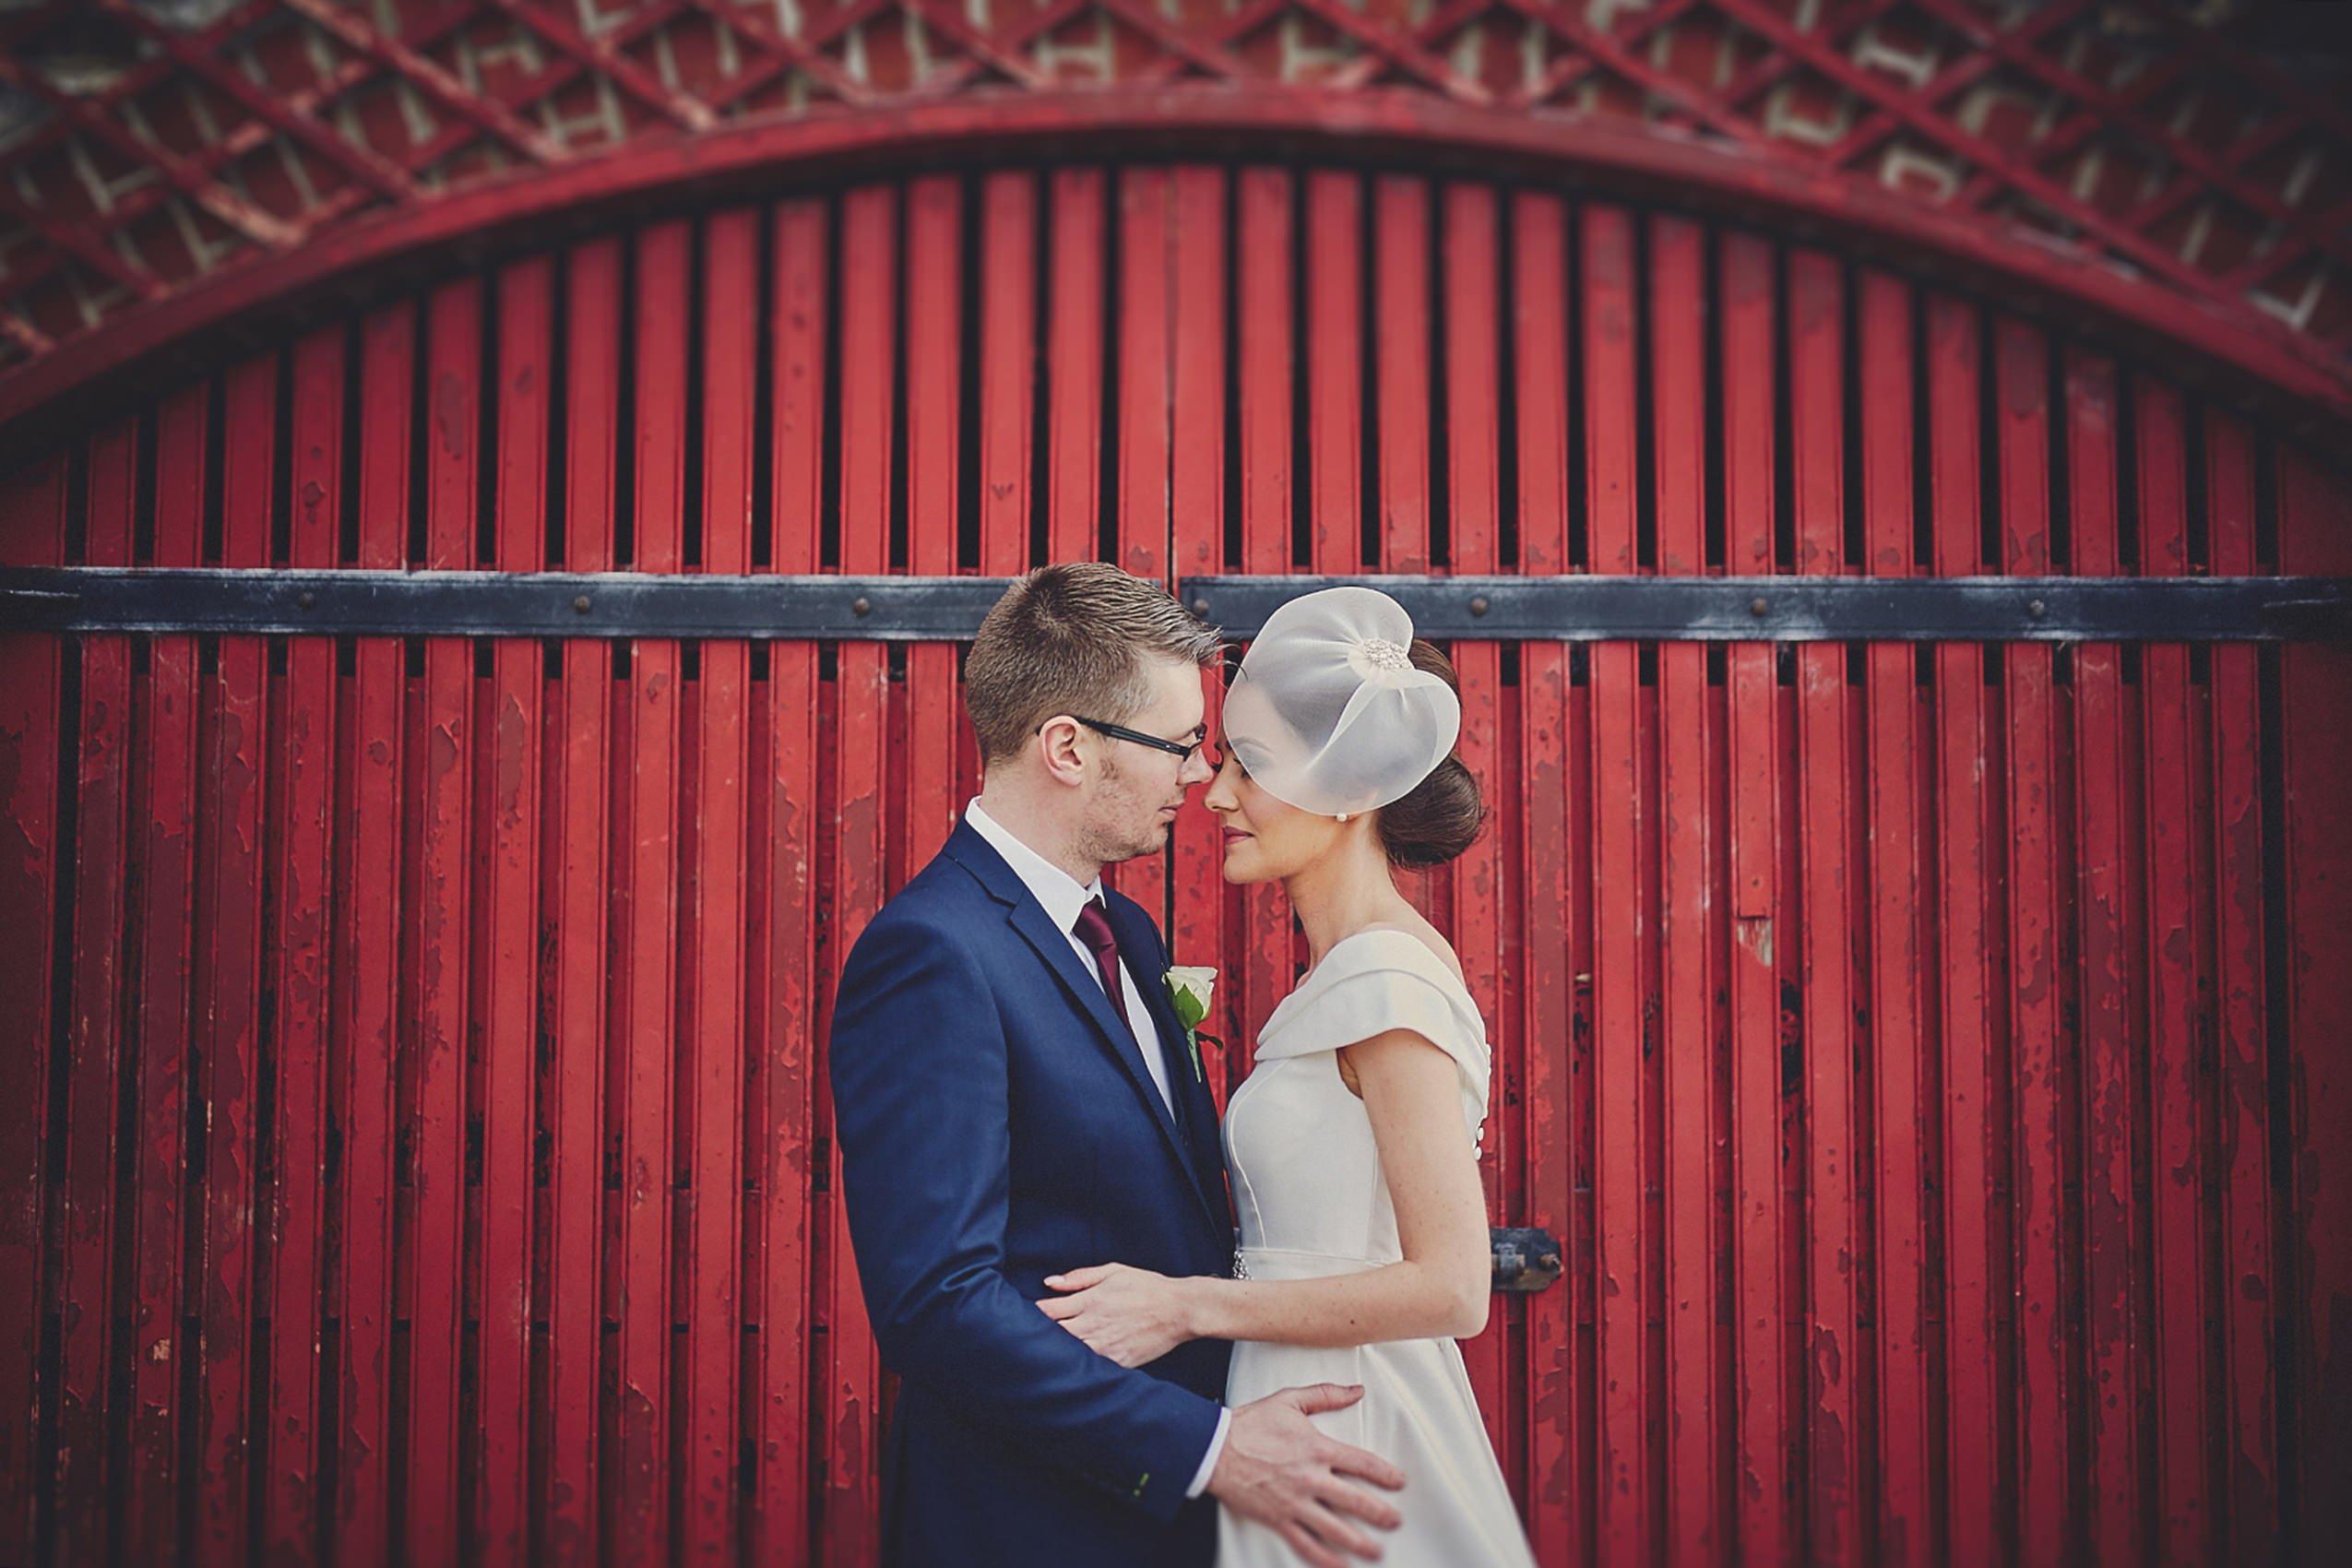 10 Wedding Anniversary Gift Ideas 2